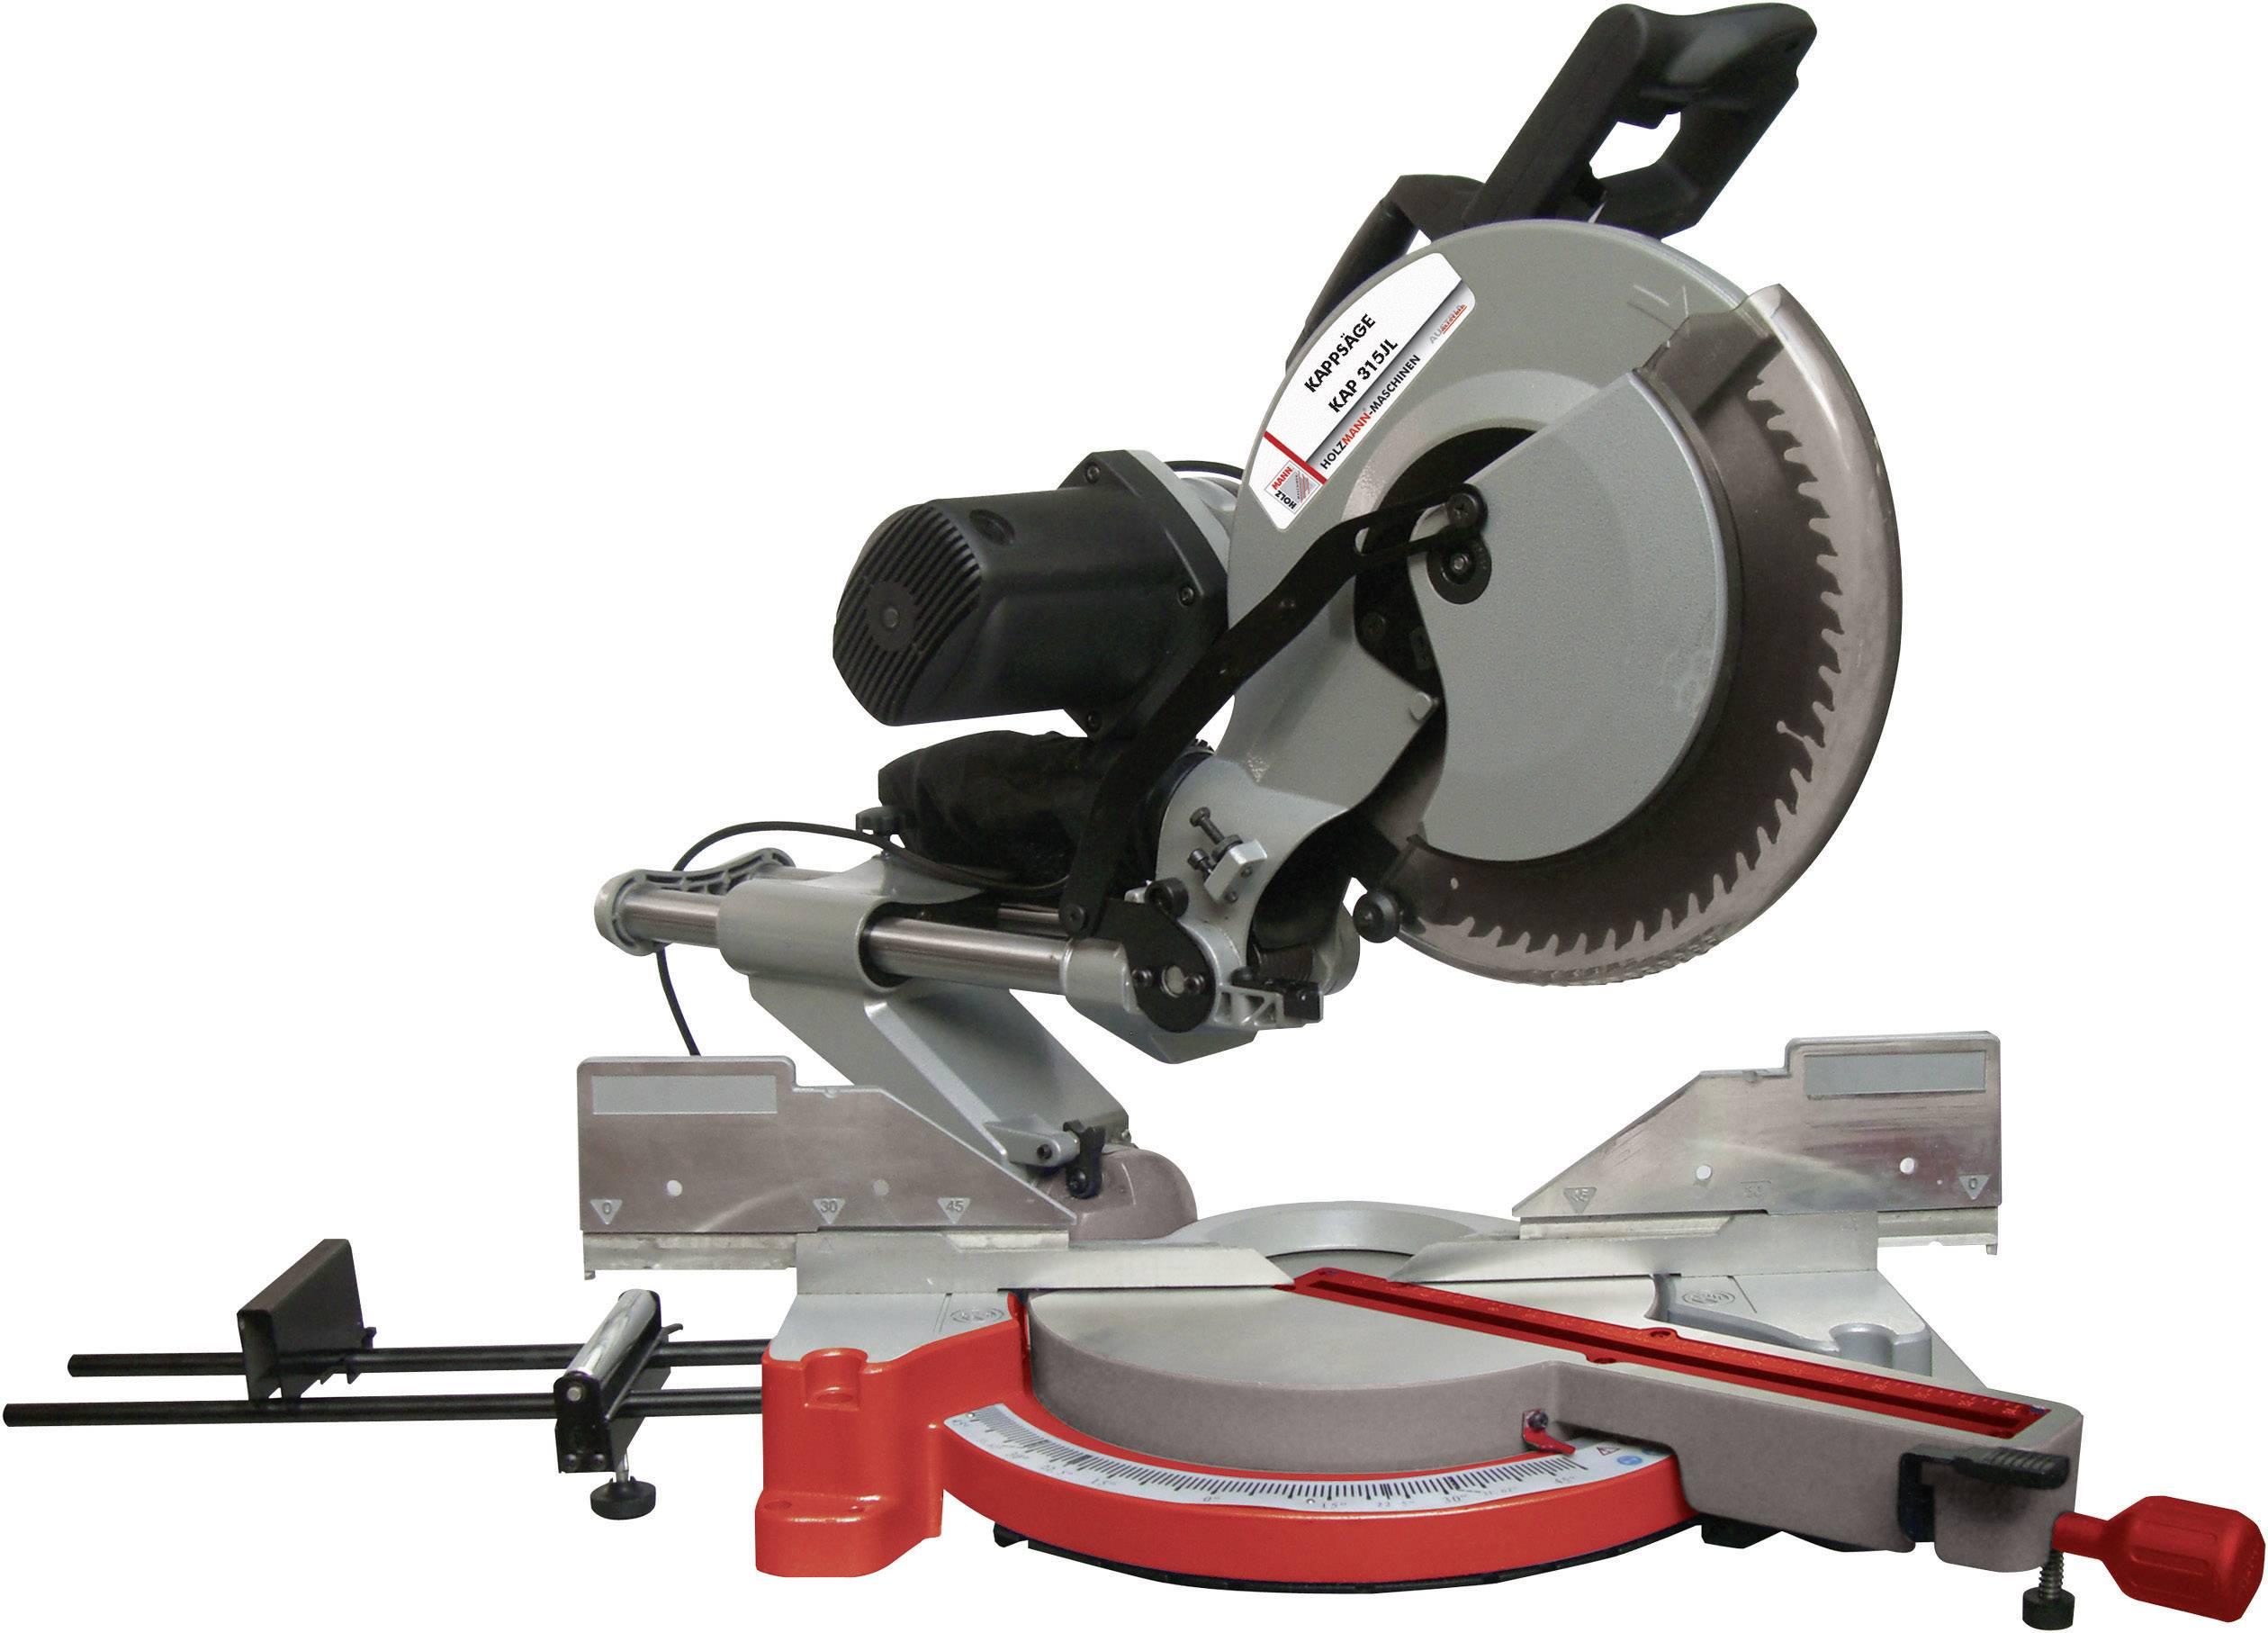 Náklopná pokosová a ťahová píla Holzmann Maschinen KAP305JL_230V H011700002